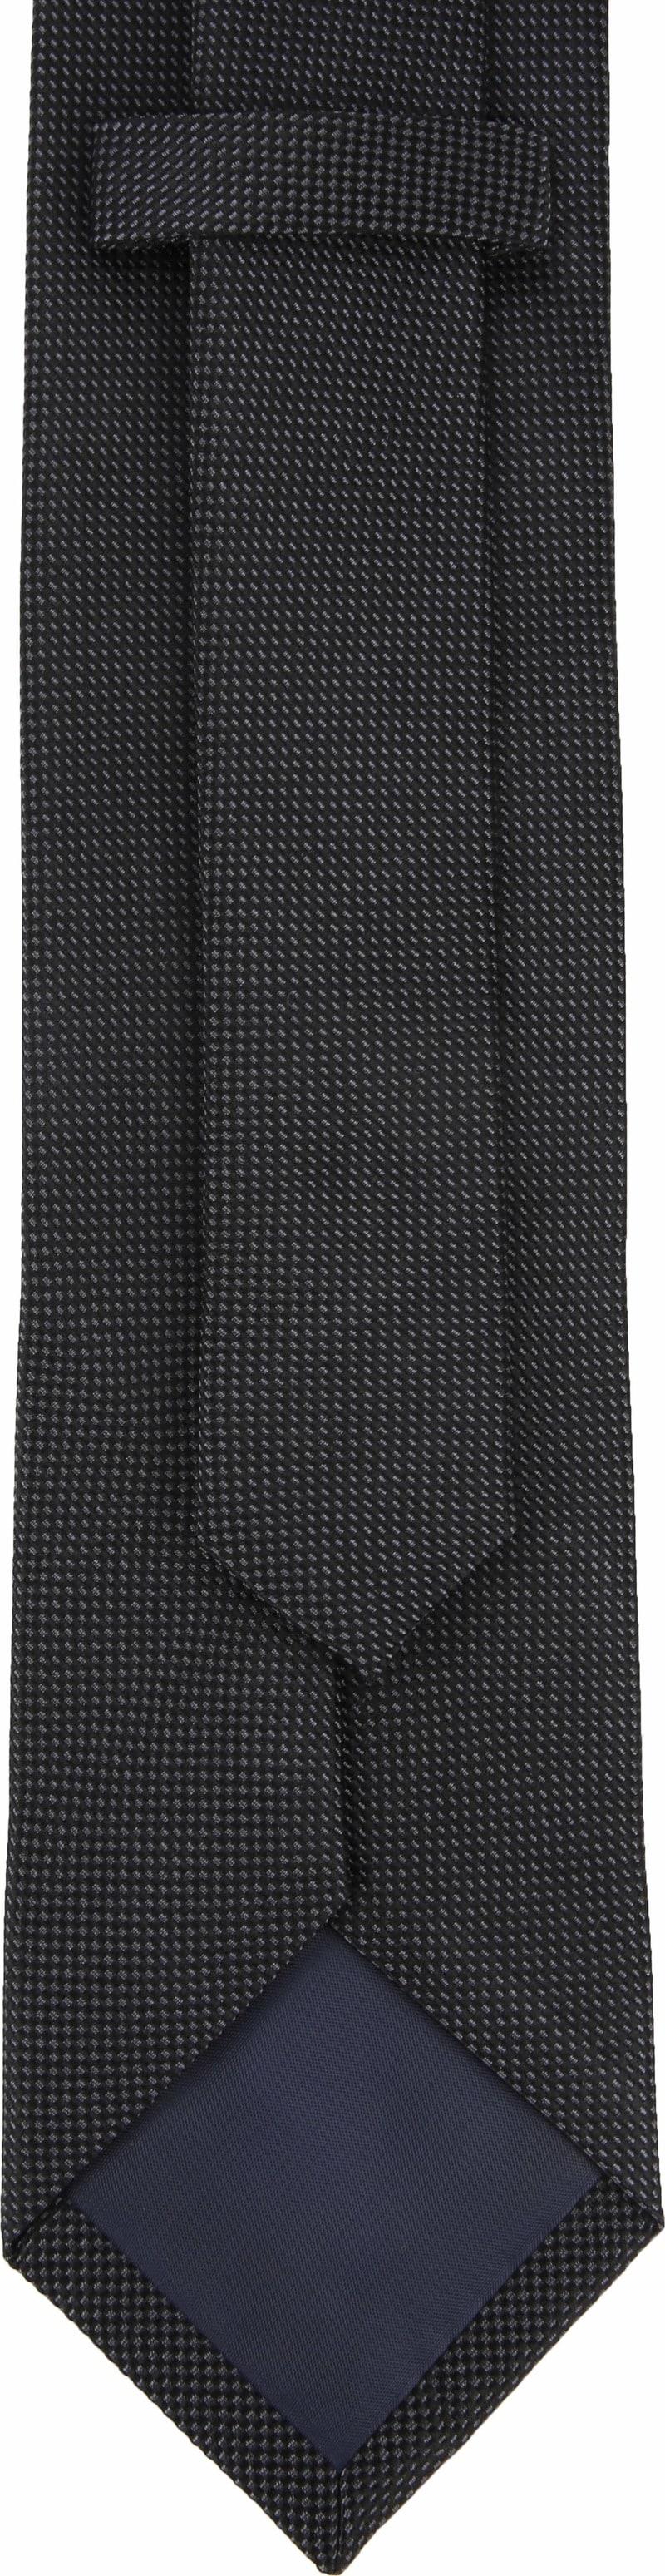 Suitable Tie Silk Black 10 photo 2